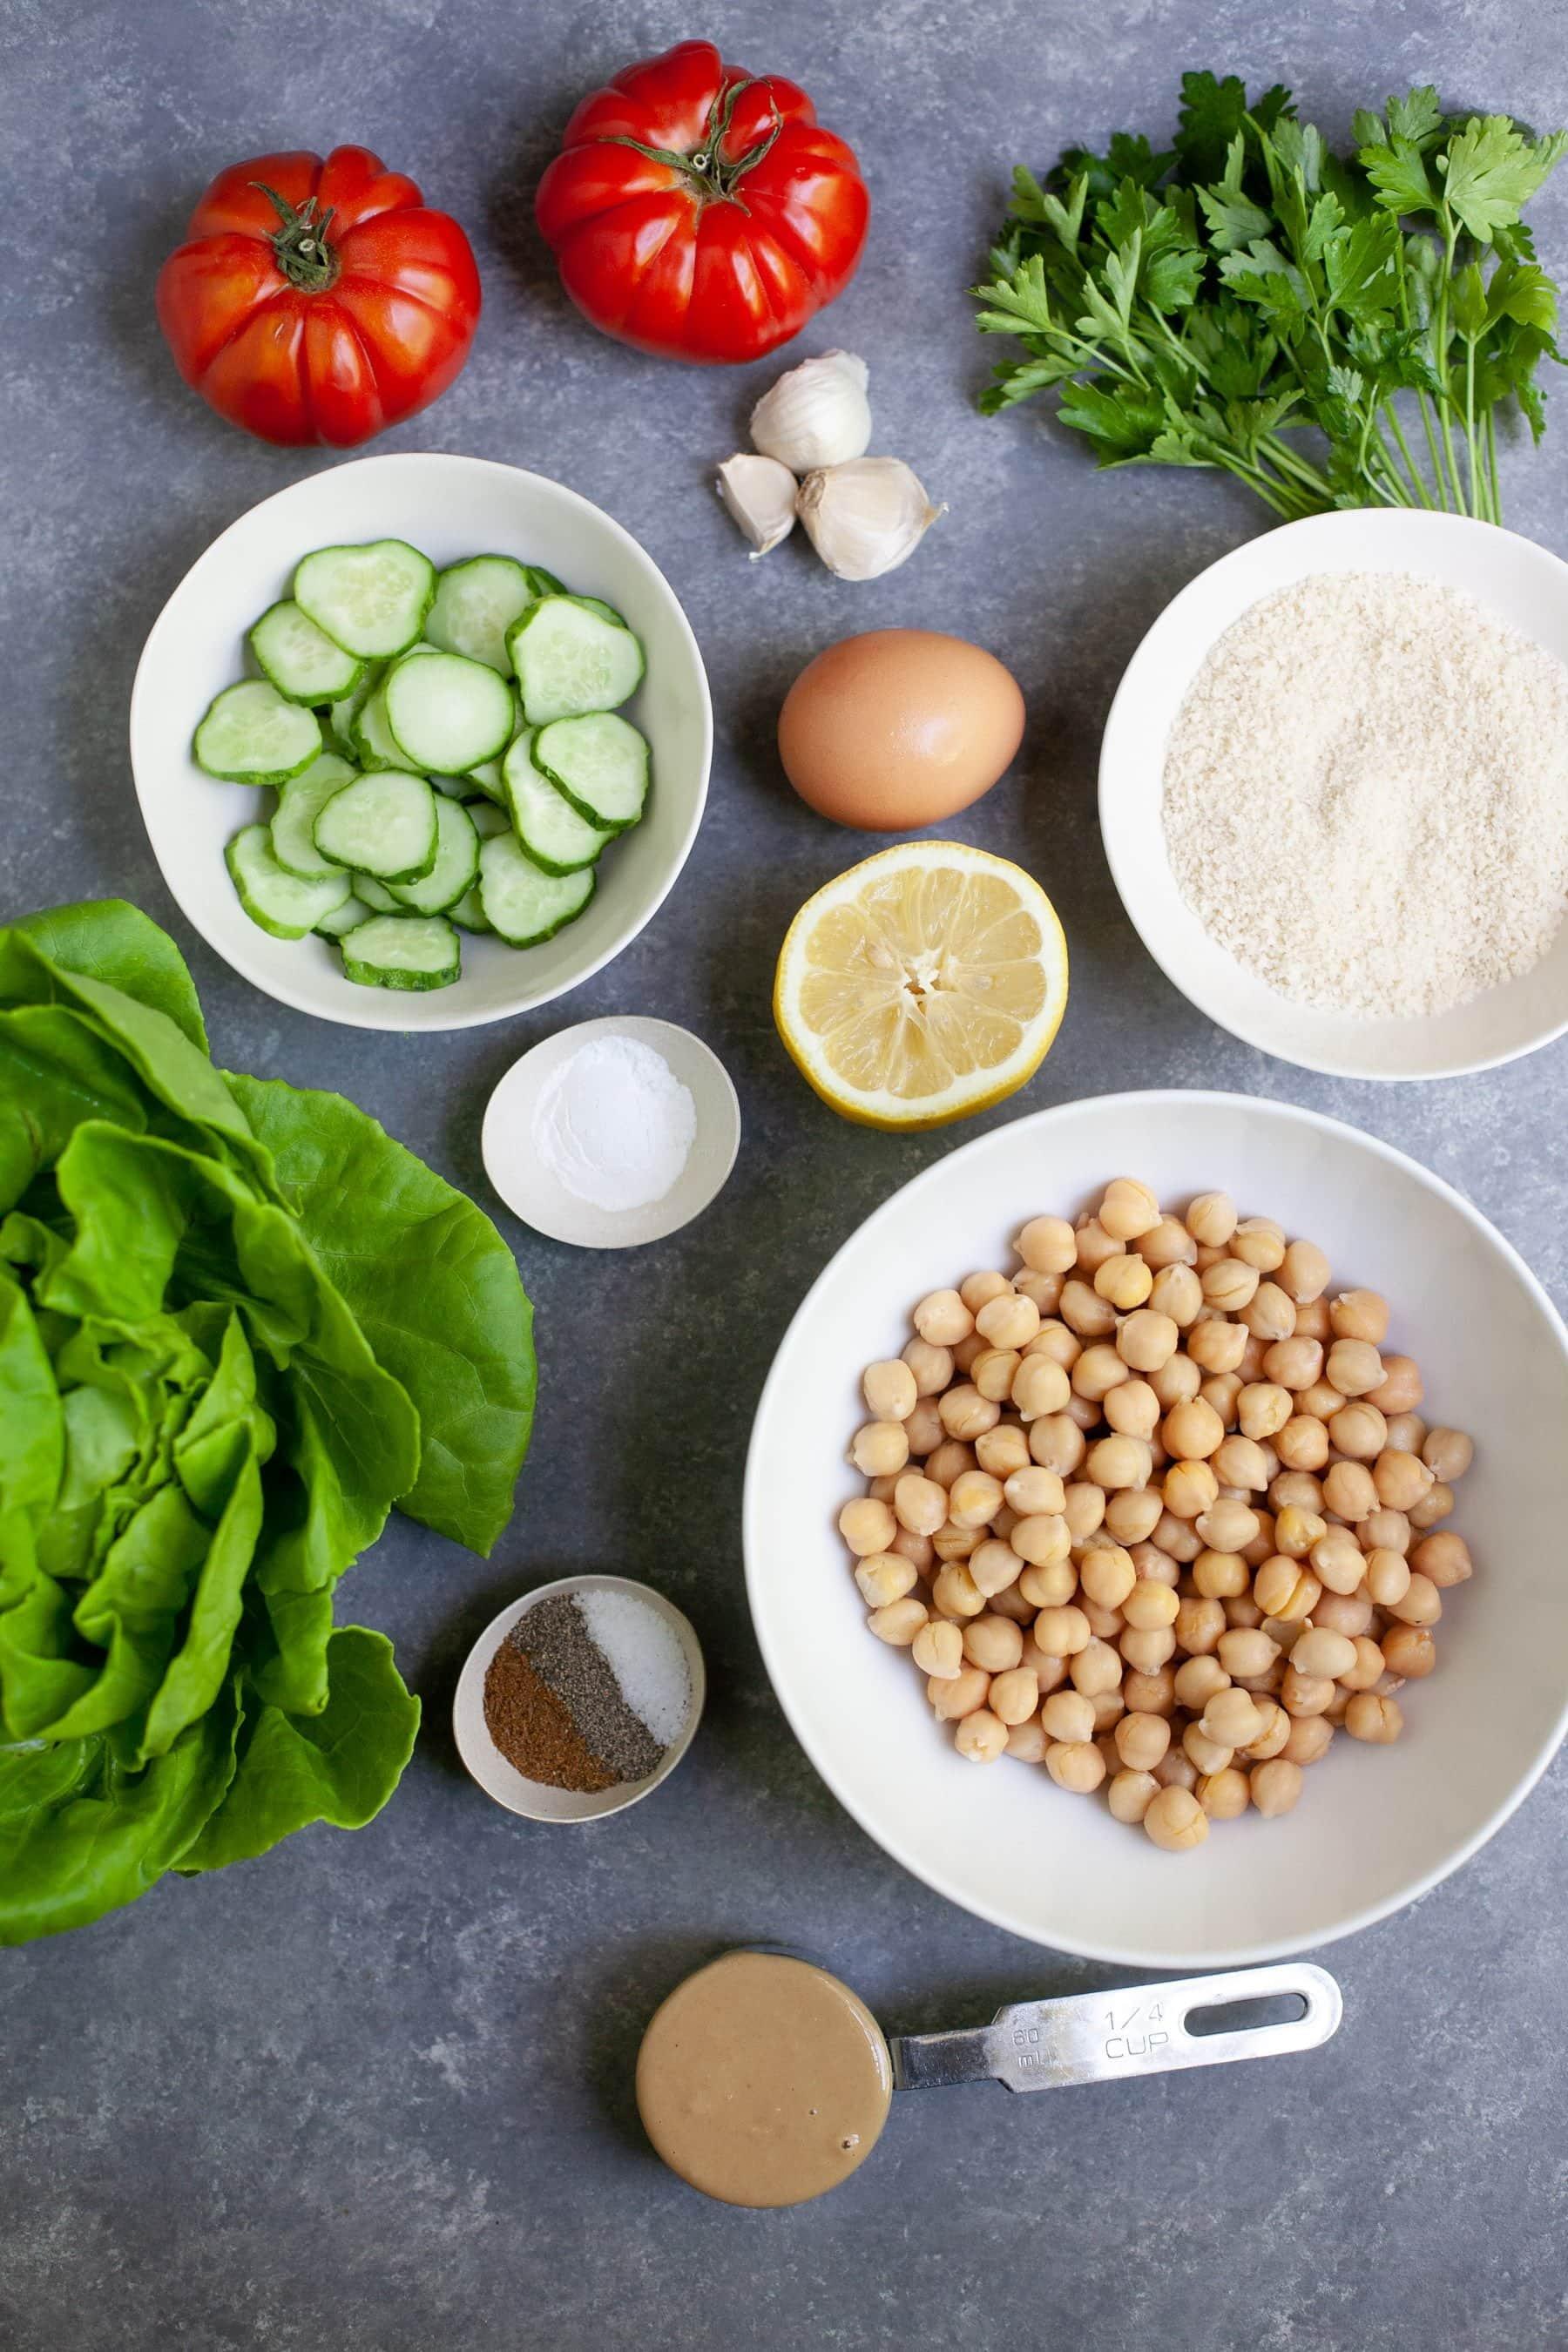 Overhead shot of ingredients for Meal Prep Baked Falafel Lettuce Wraps - chickpeas, lettuce, lemon, cucumber, egg